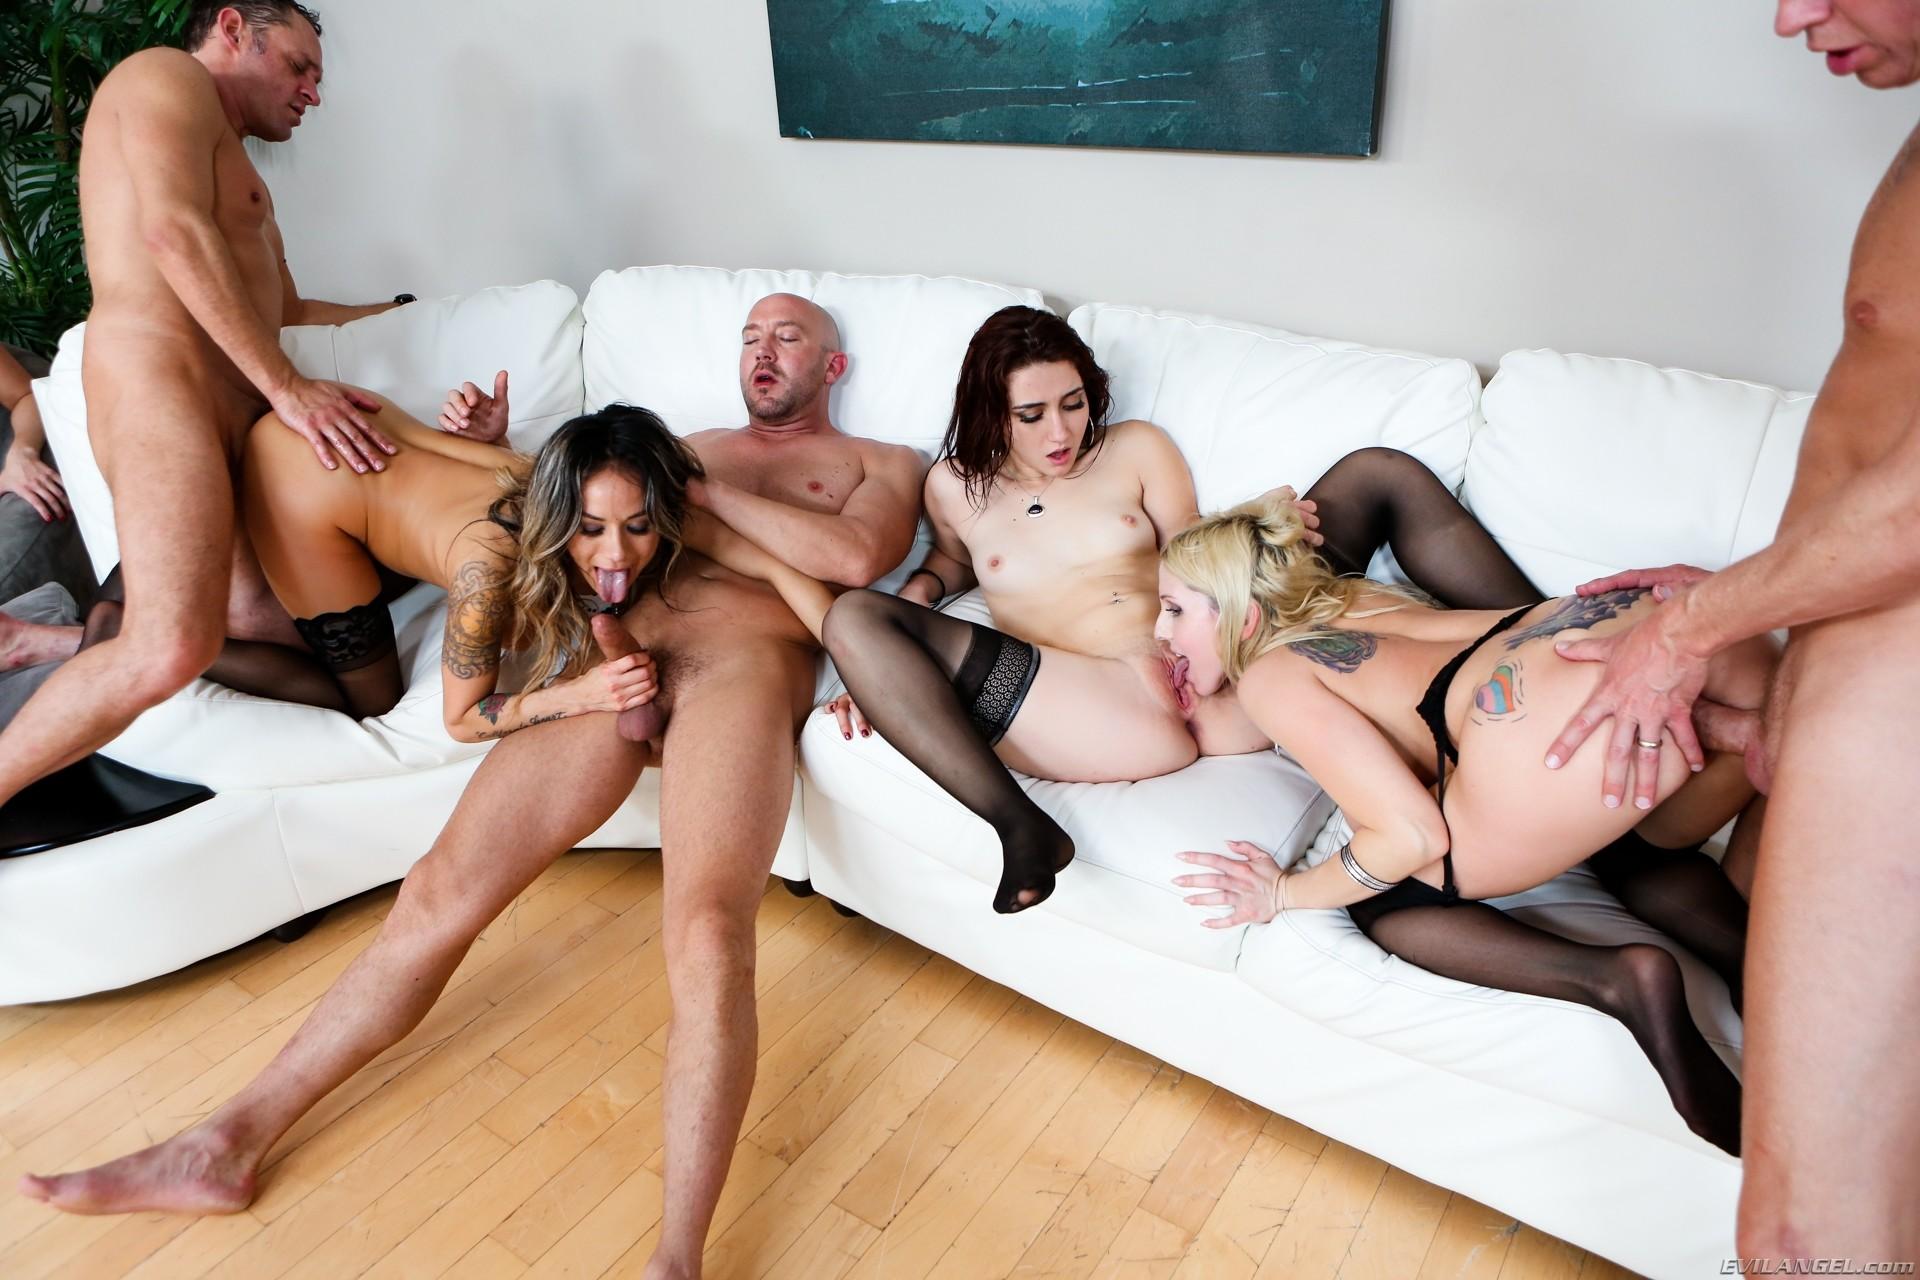 Xxx teacher orgy, amateur porn videps